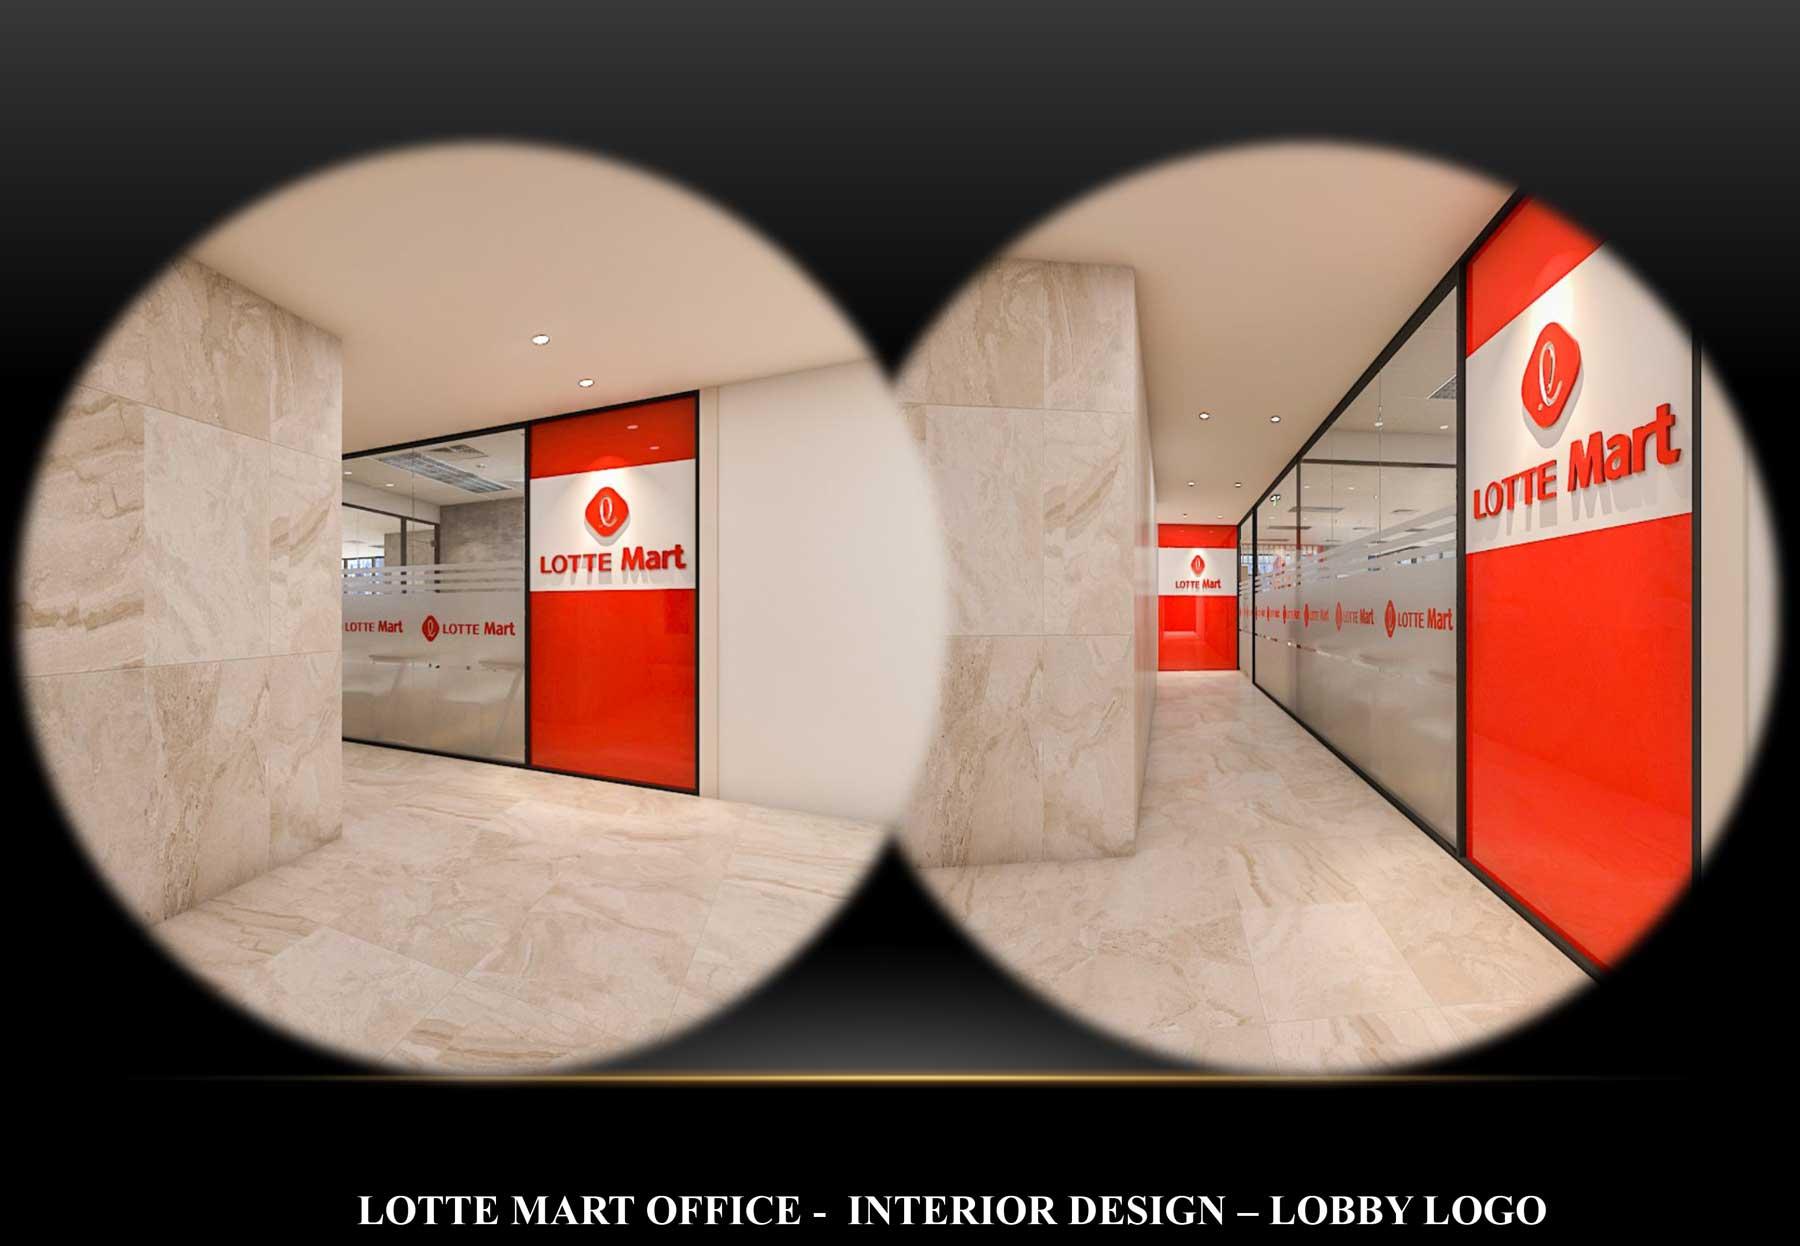 LOTTE-MART-OFFICE-INTERIOR-DESIGN-FINAL-0531-6